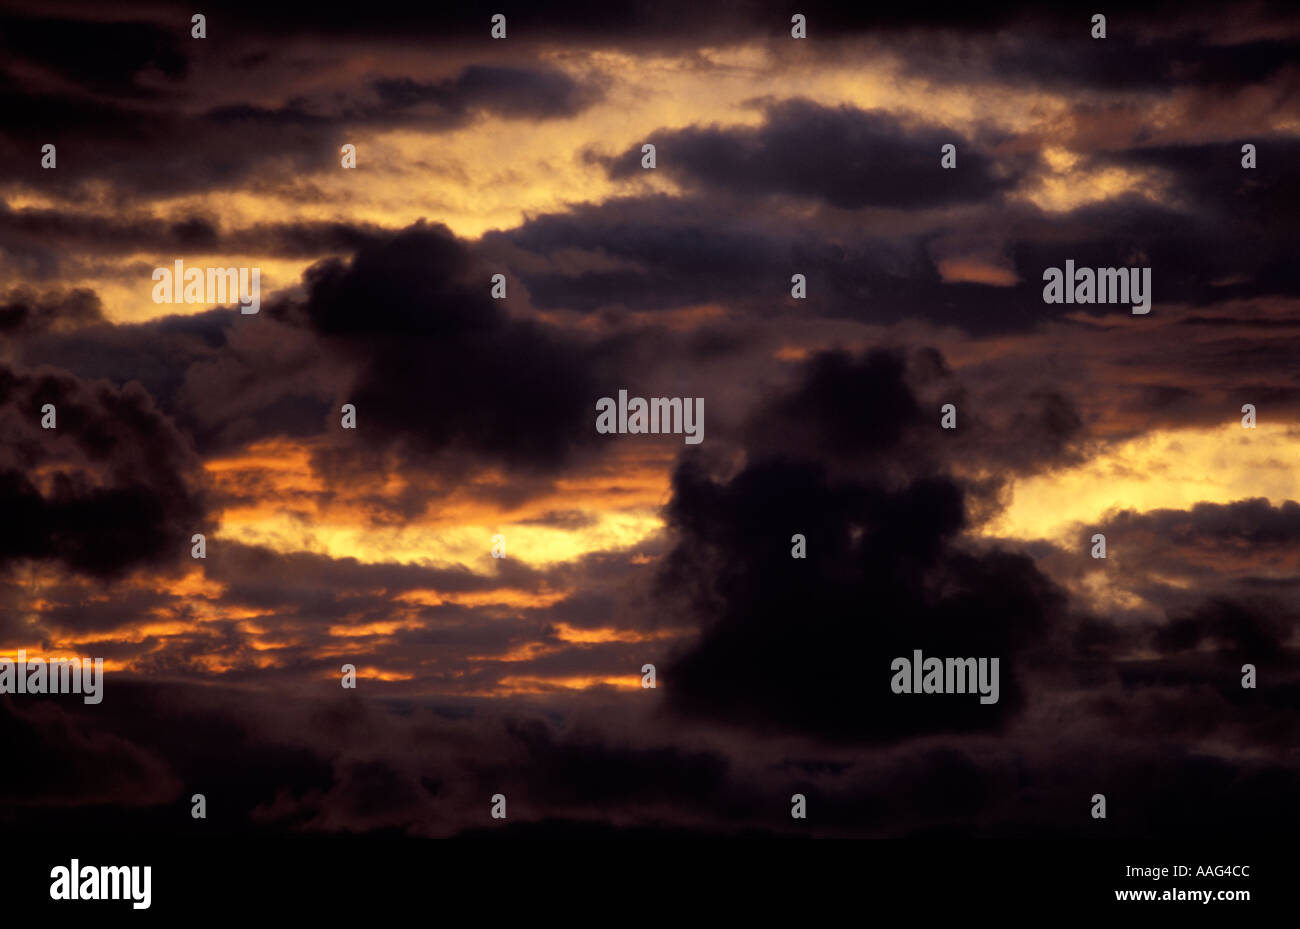 Spectacular cloud formations at sunset Amantani island Lake Titicaca Peru South America - Stock Image